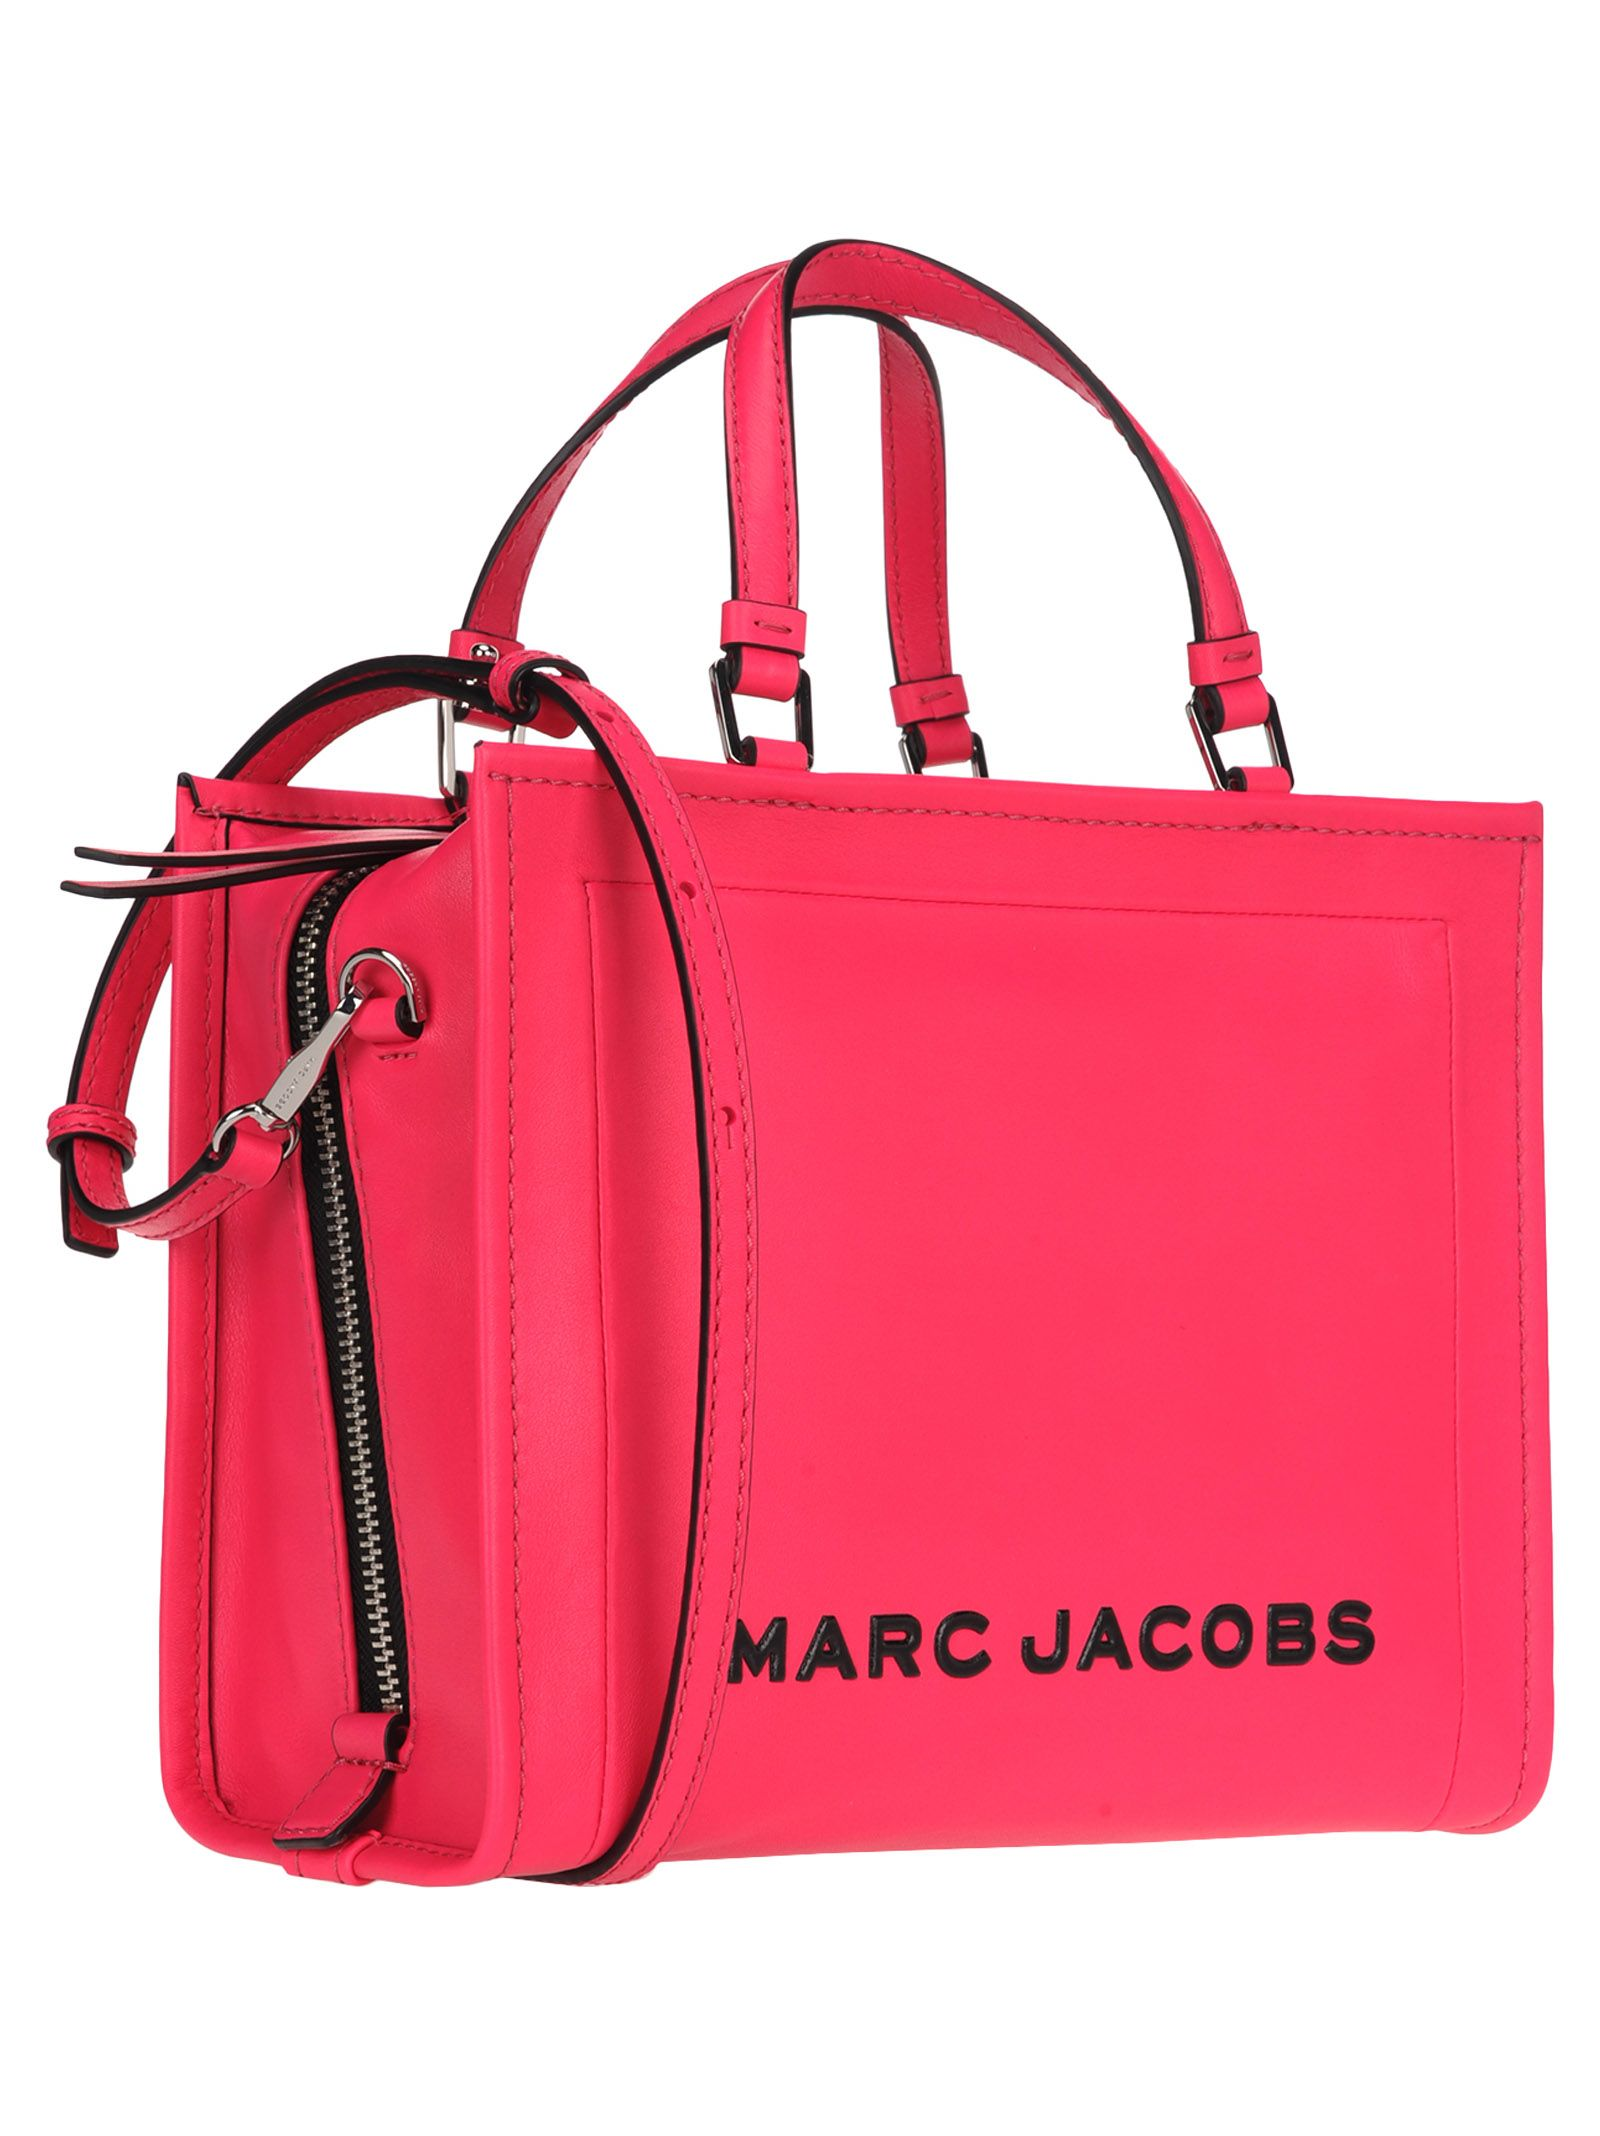 e6b63e81d5f0 Marc Jacobs Marc Jacobs The Box Shopper 29 - PEONY PINK - 10798755 ...